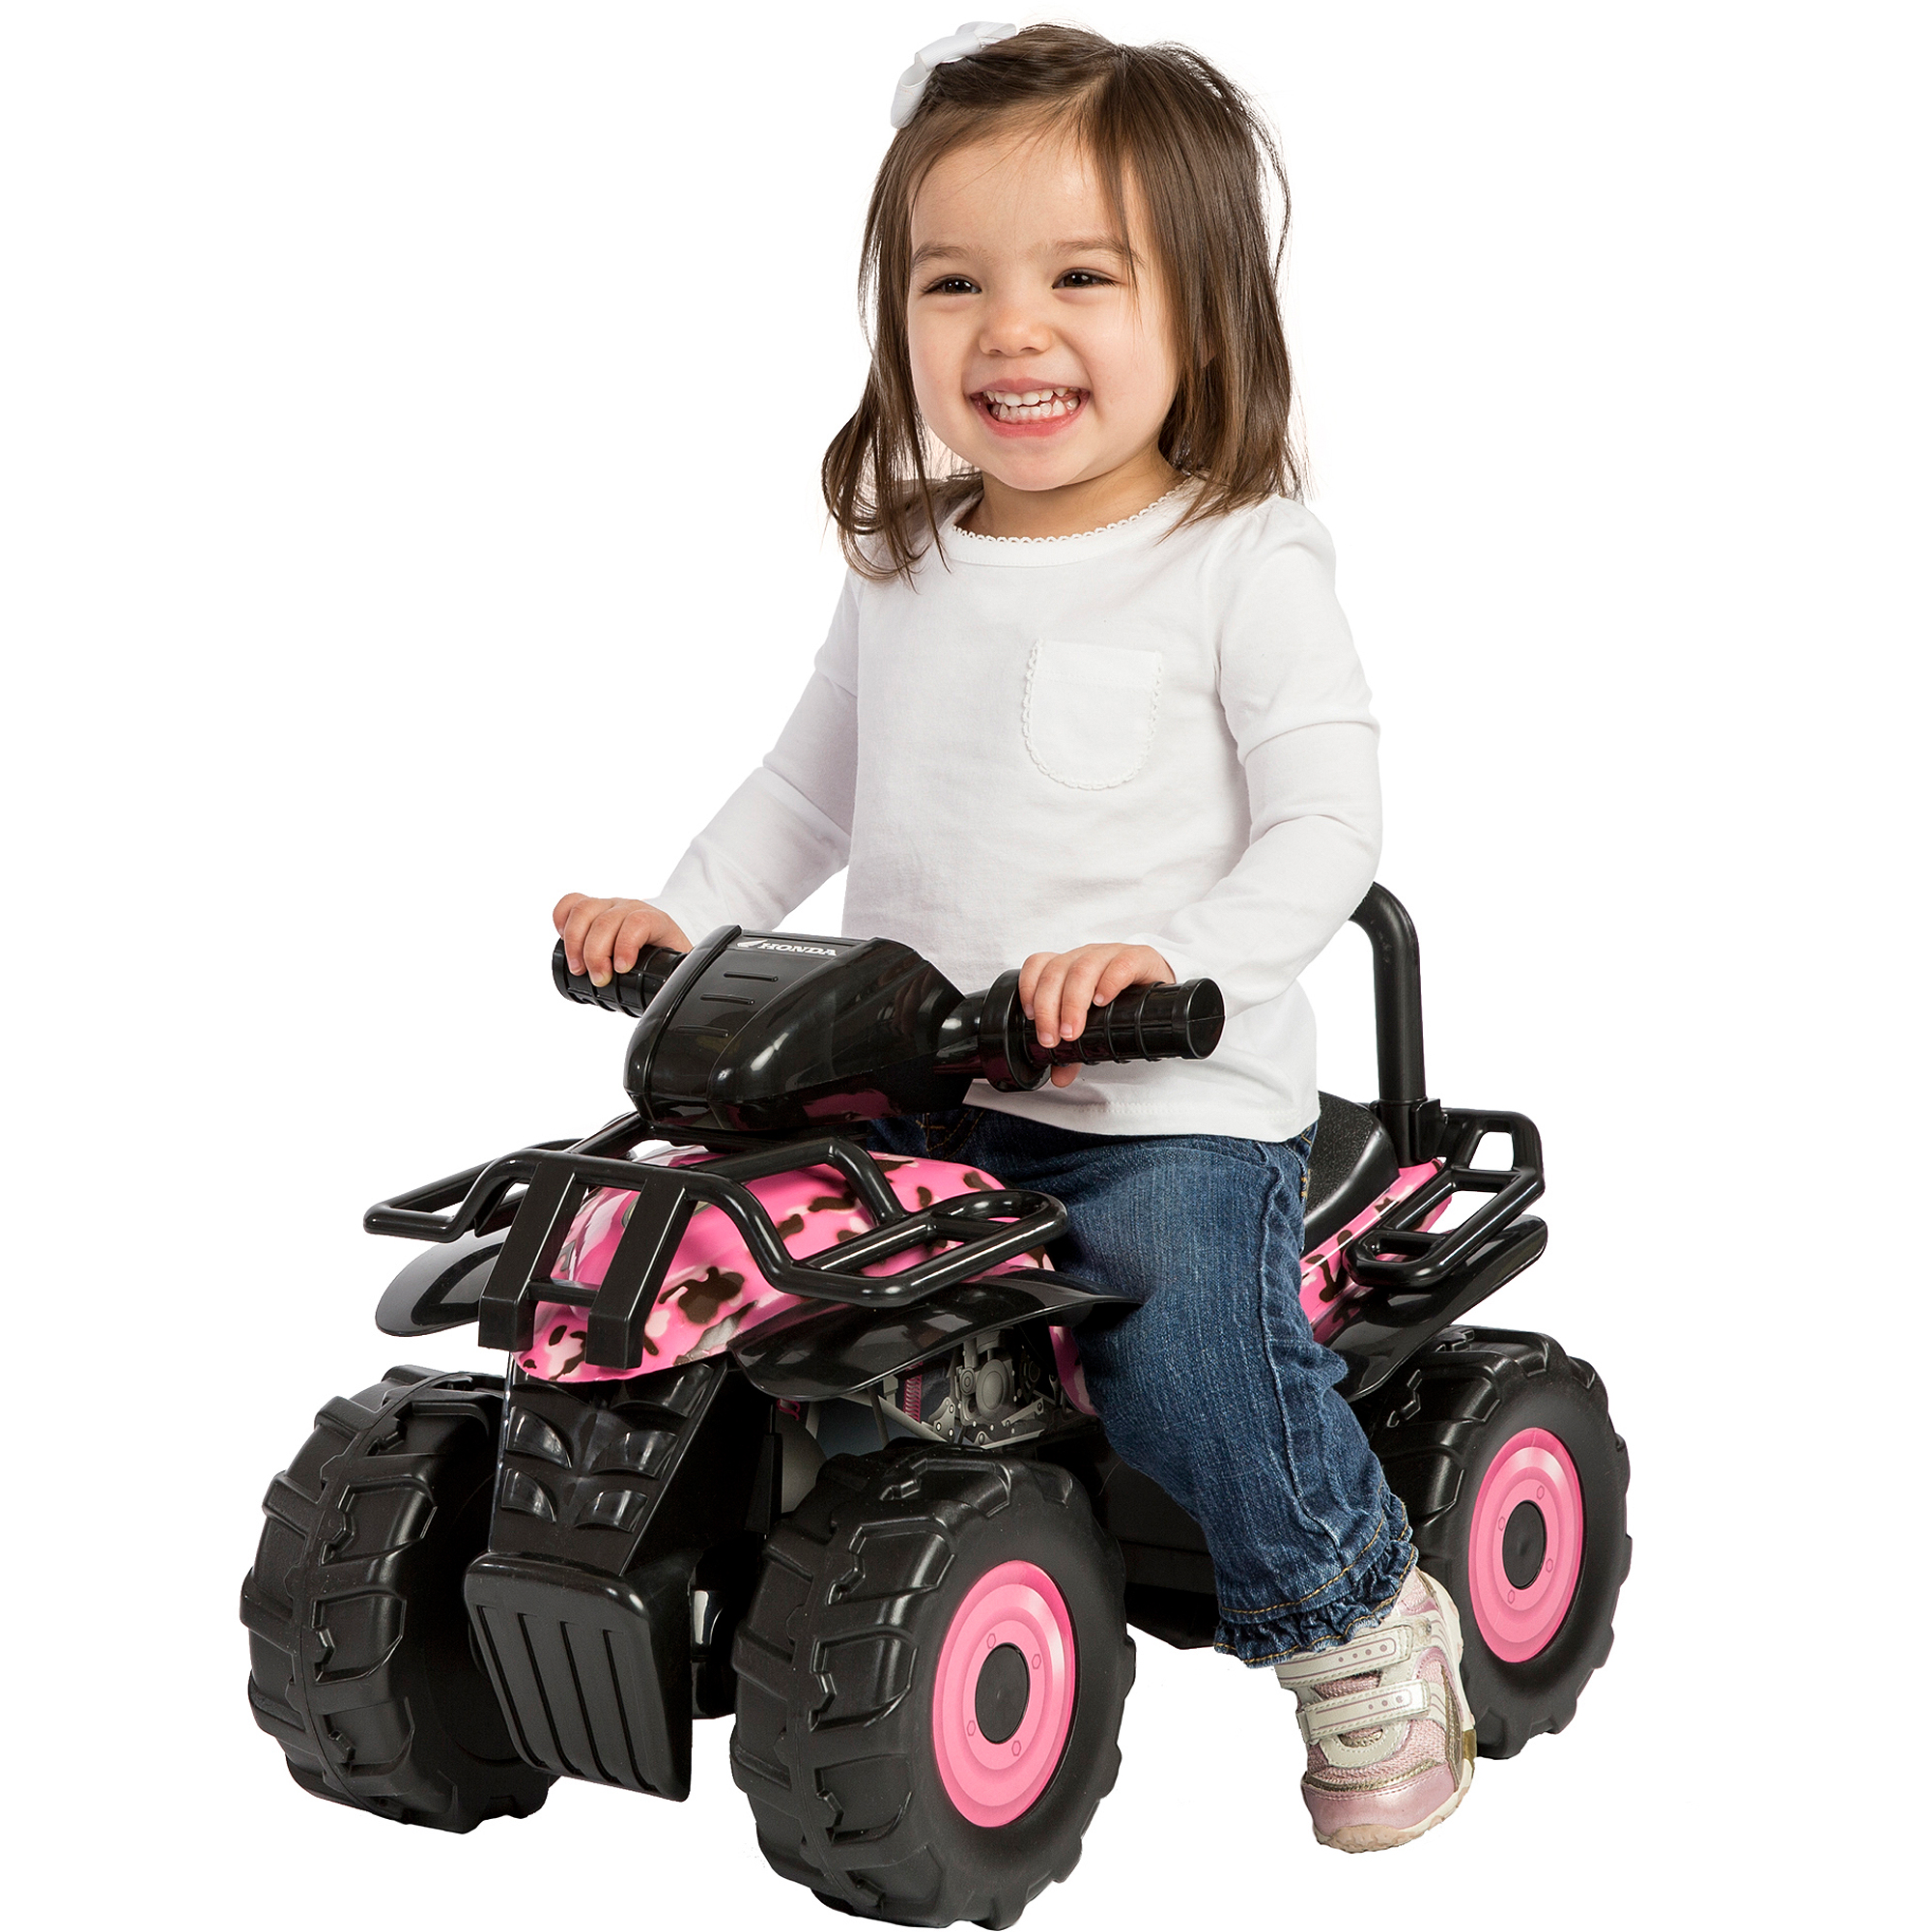 Honda Utility ATV Ride-On, Pink Camo